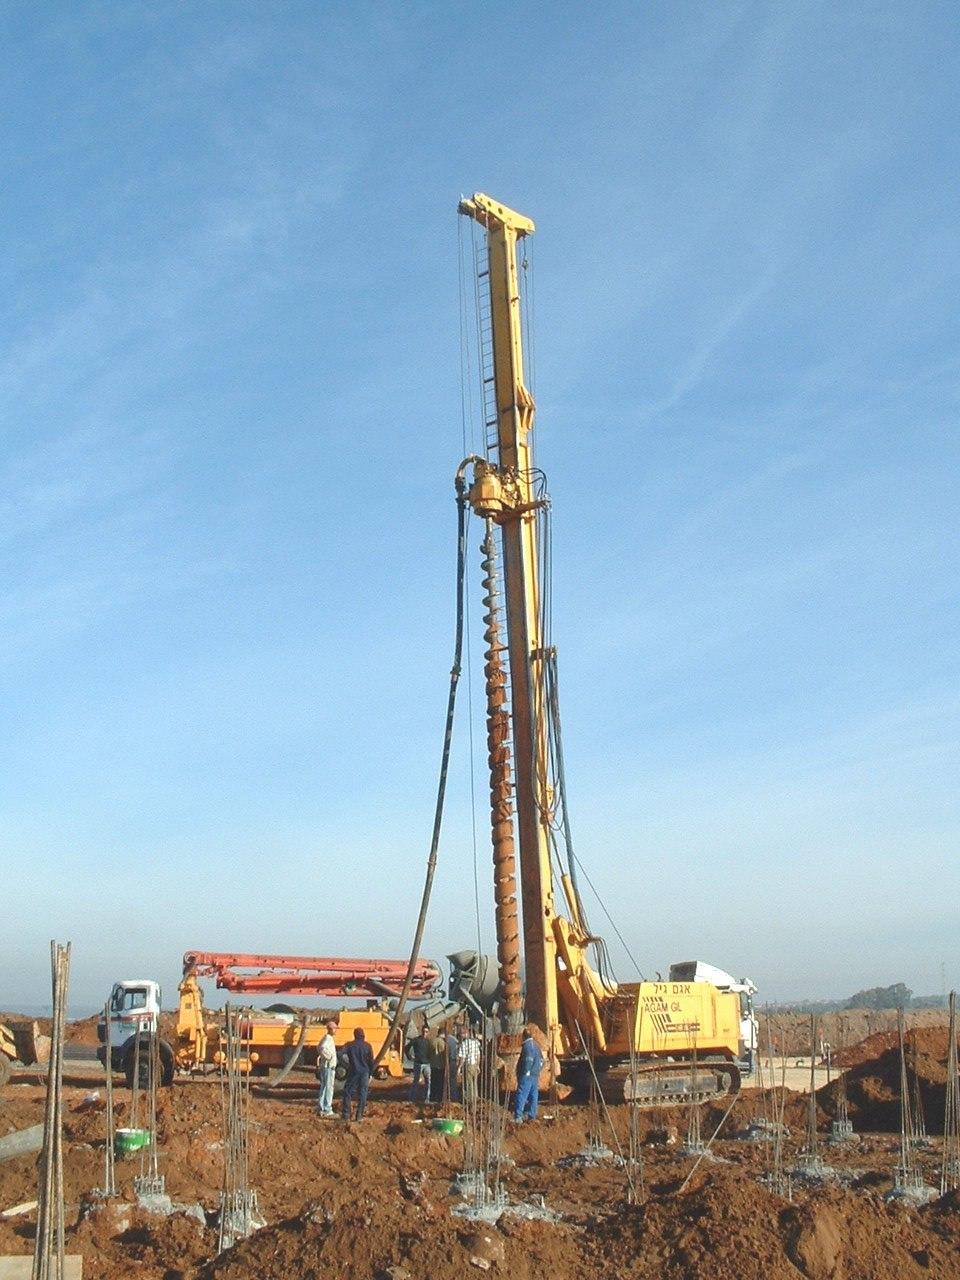 DrillingMachine with ConcreteMixer and Pump02